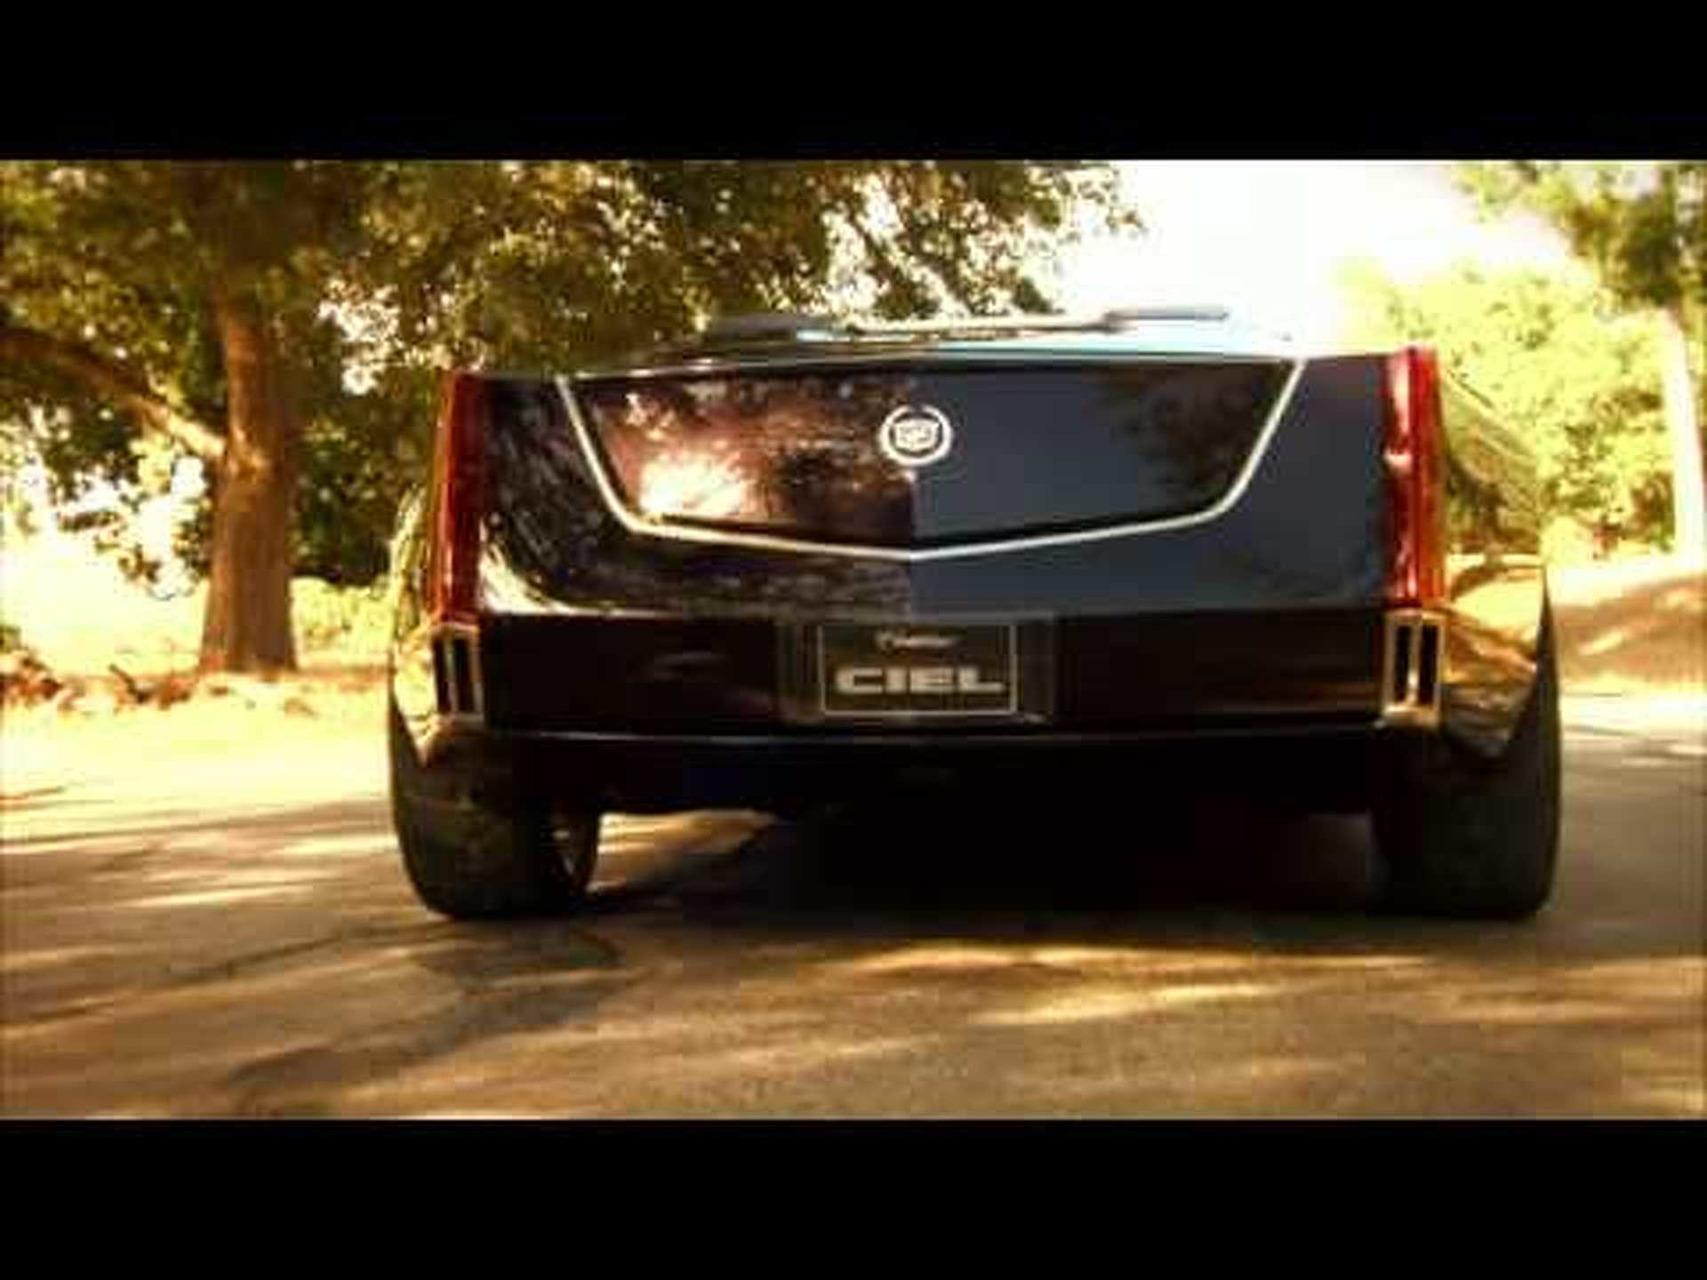 2012 Cadillac Ciel Concept Design